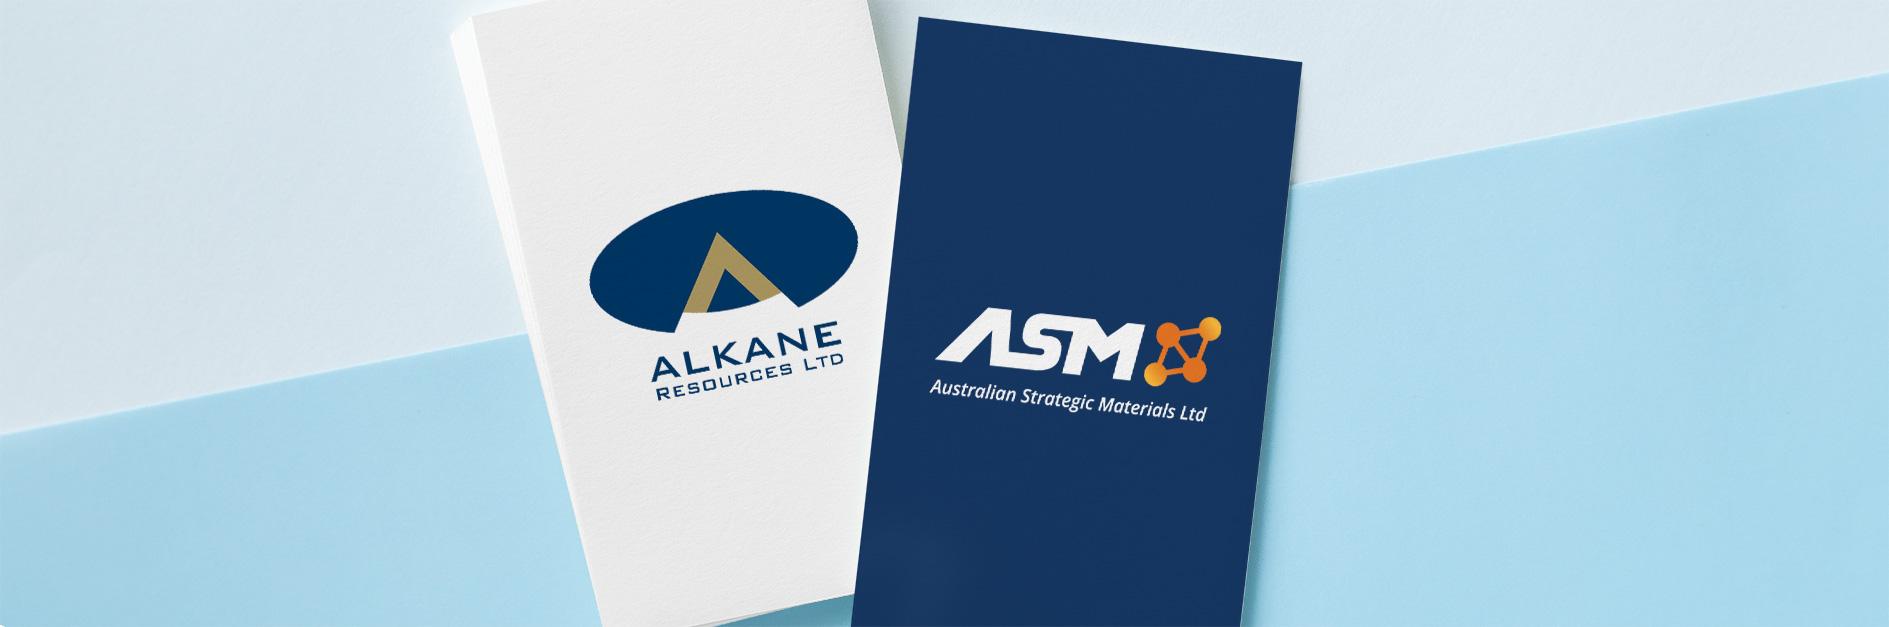 ASM demerger approved